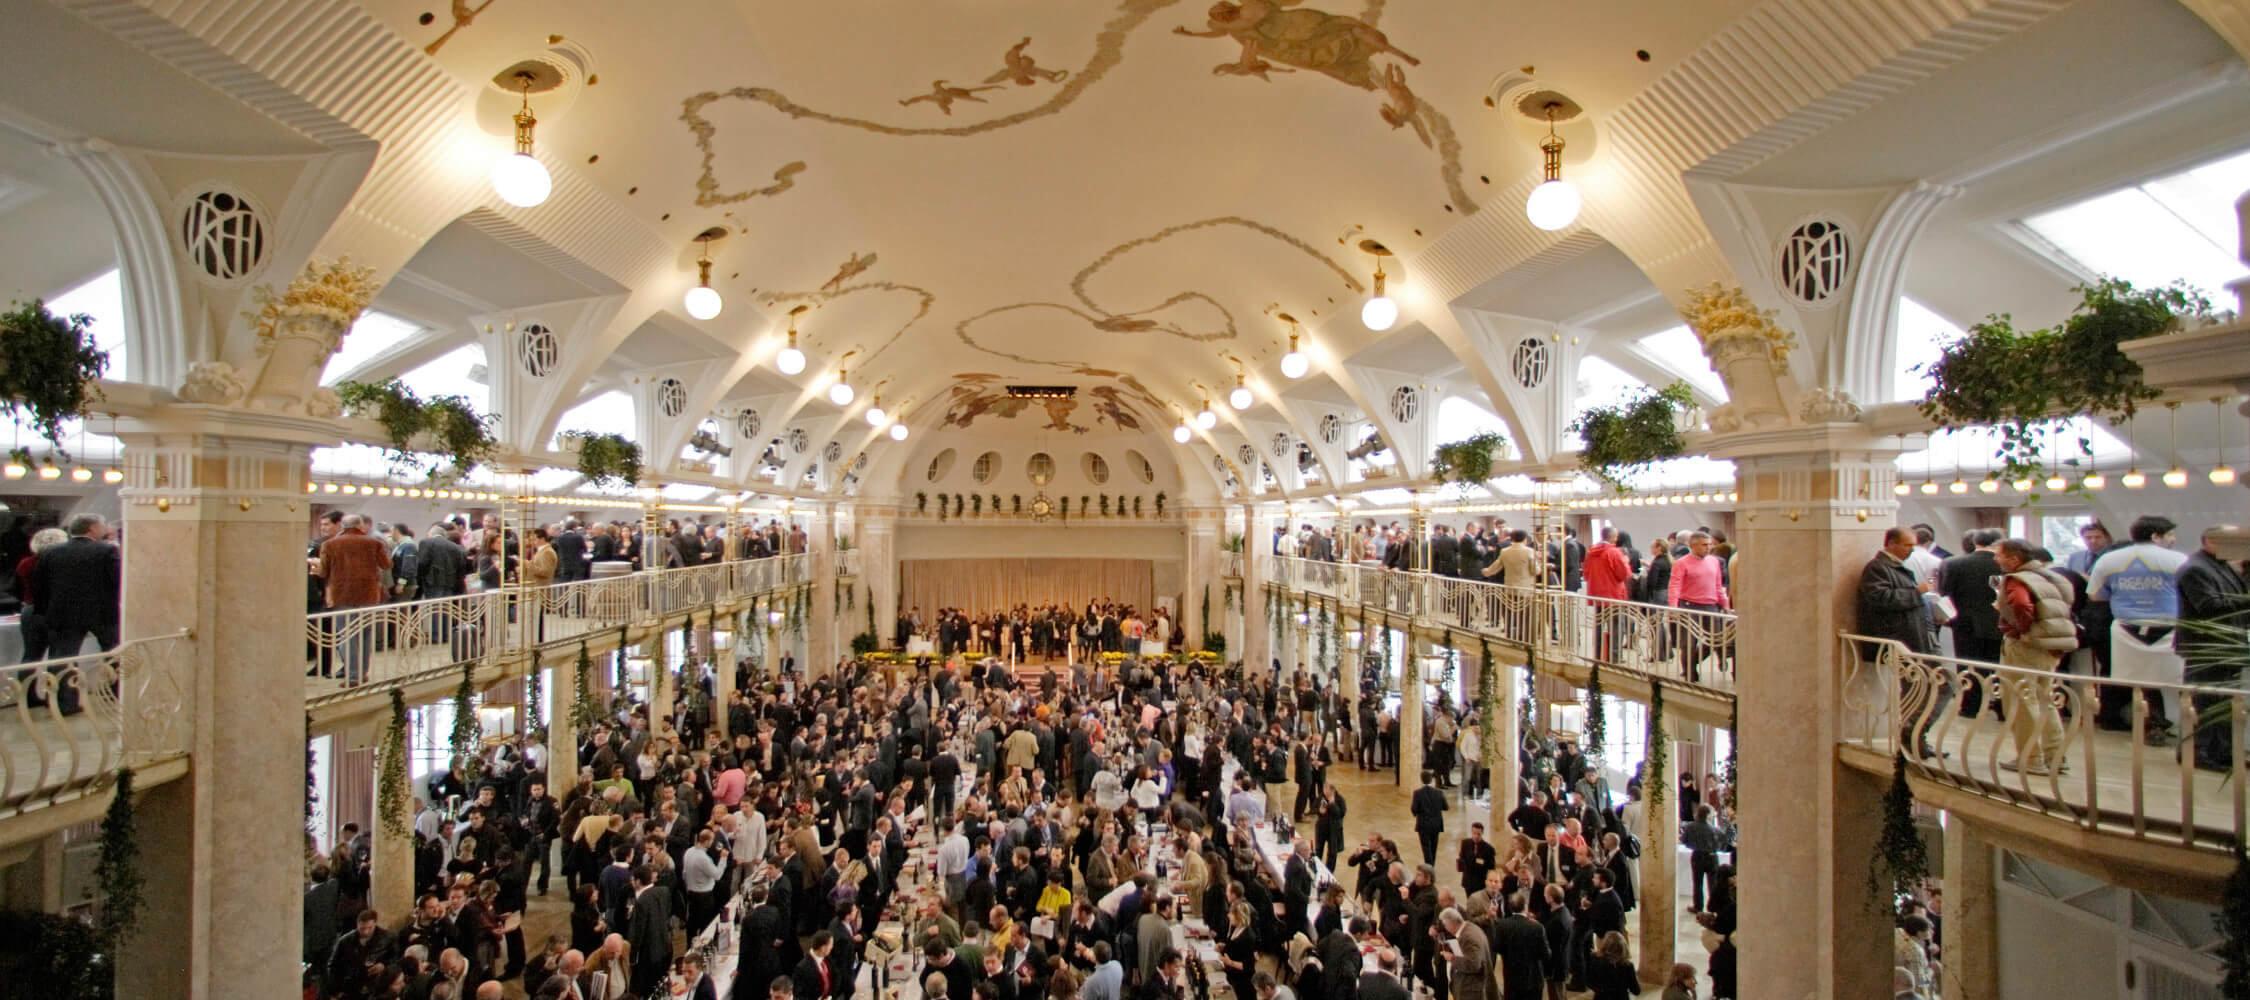 Italien-Trentino_Suedtirol_Alto_Adige_Merano_Meran_Business_Convention_Event_Kursaal_Winefestival_MGM-Frieder-Blickle_mgm01259idm_2250x1000